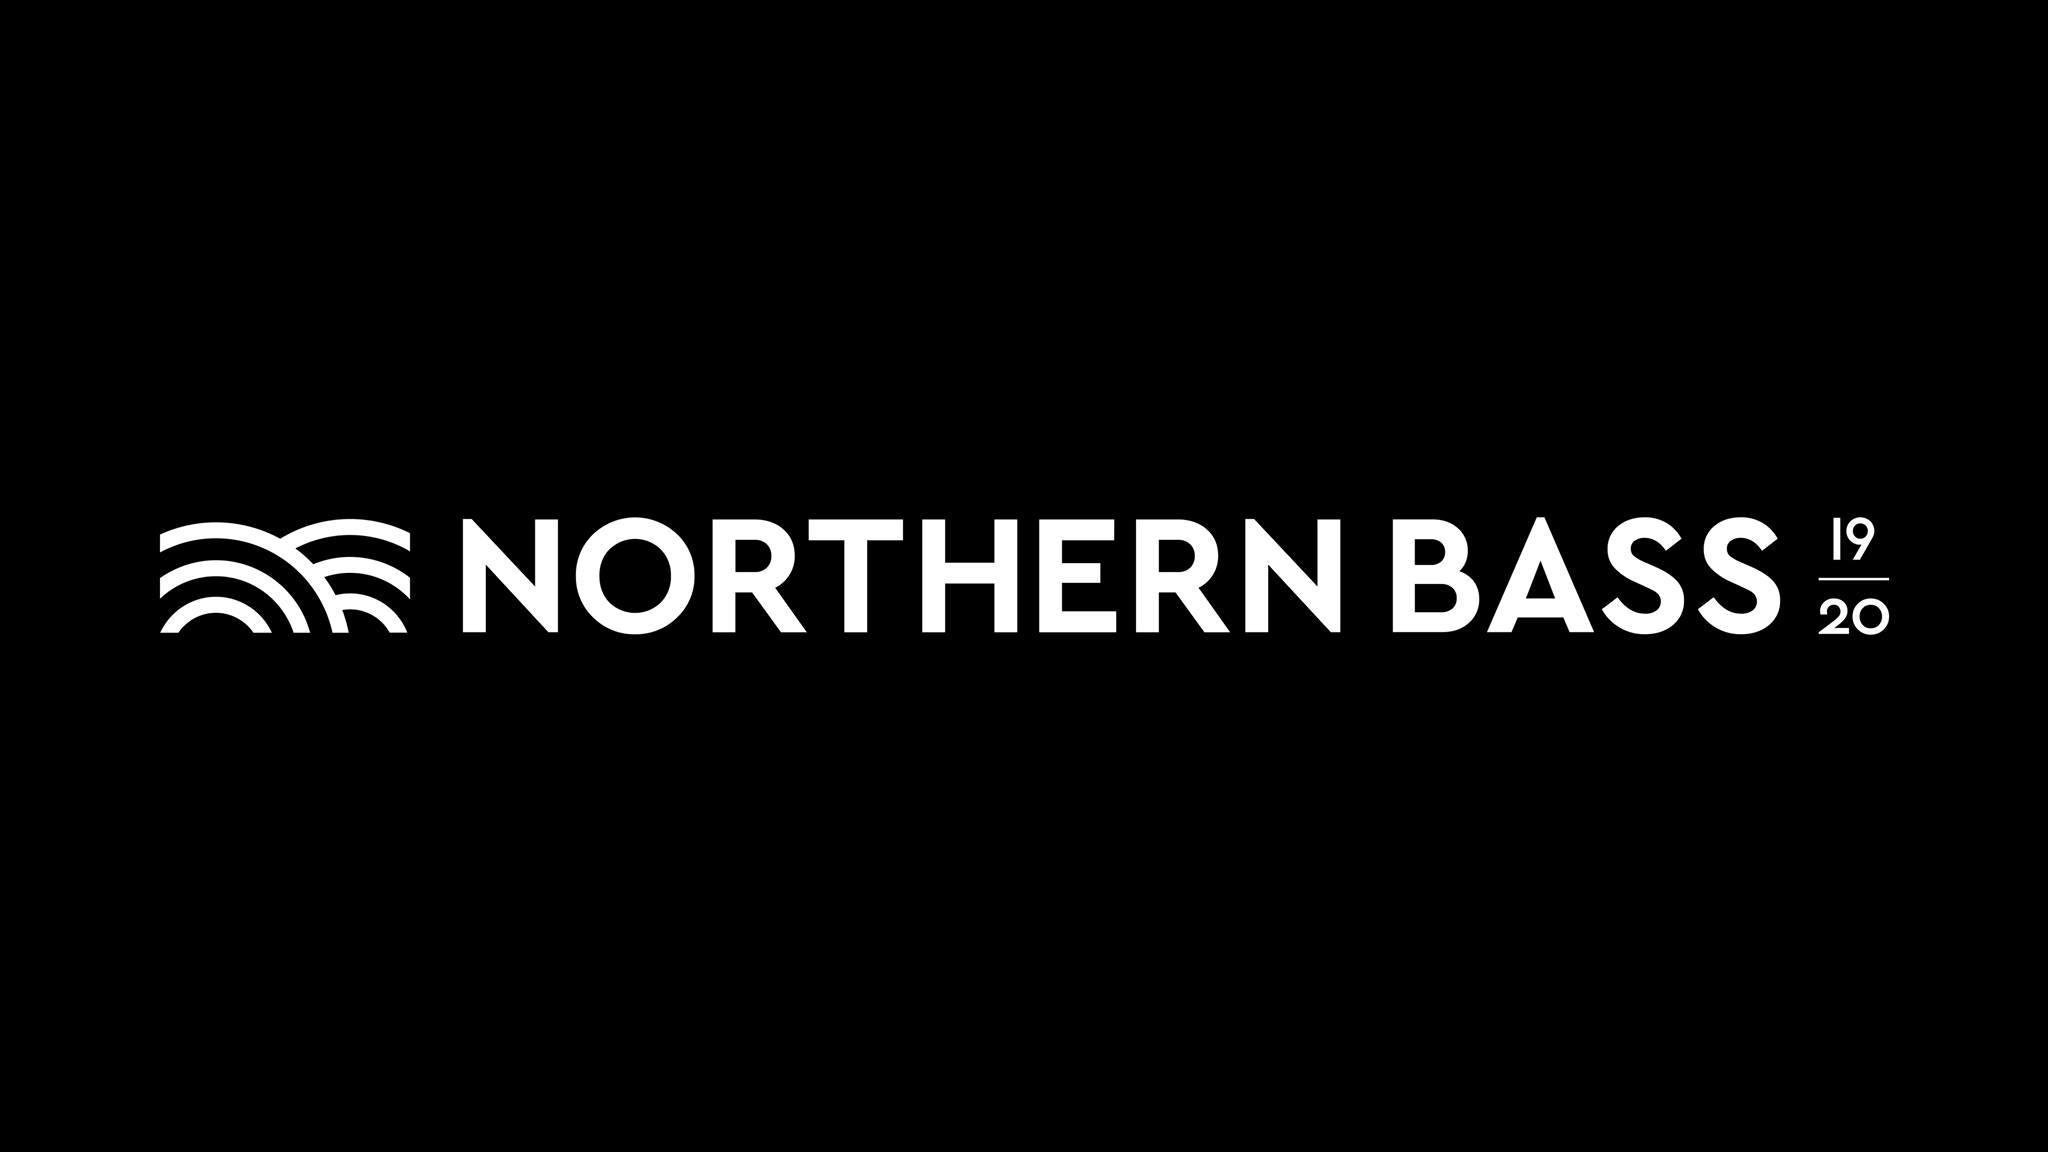 Northern Bass Music Festival New Zealand 2019 : 2020